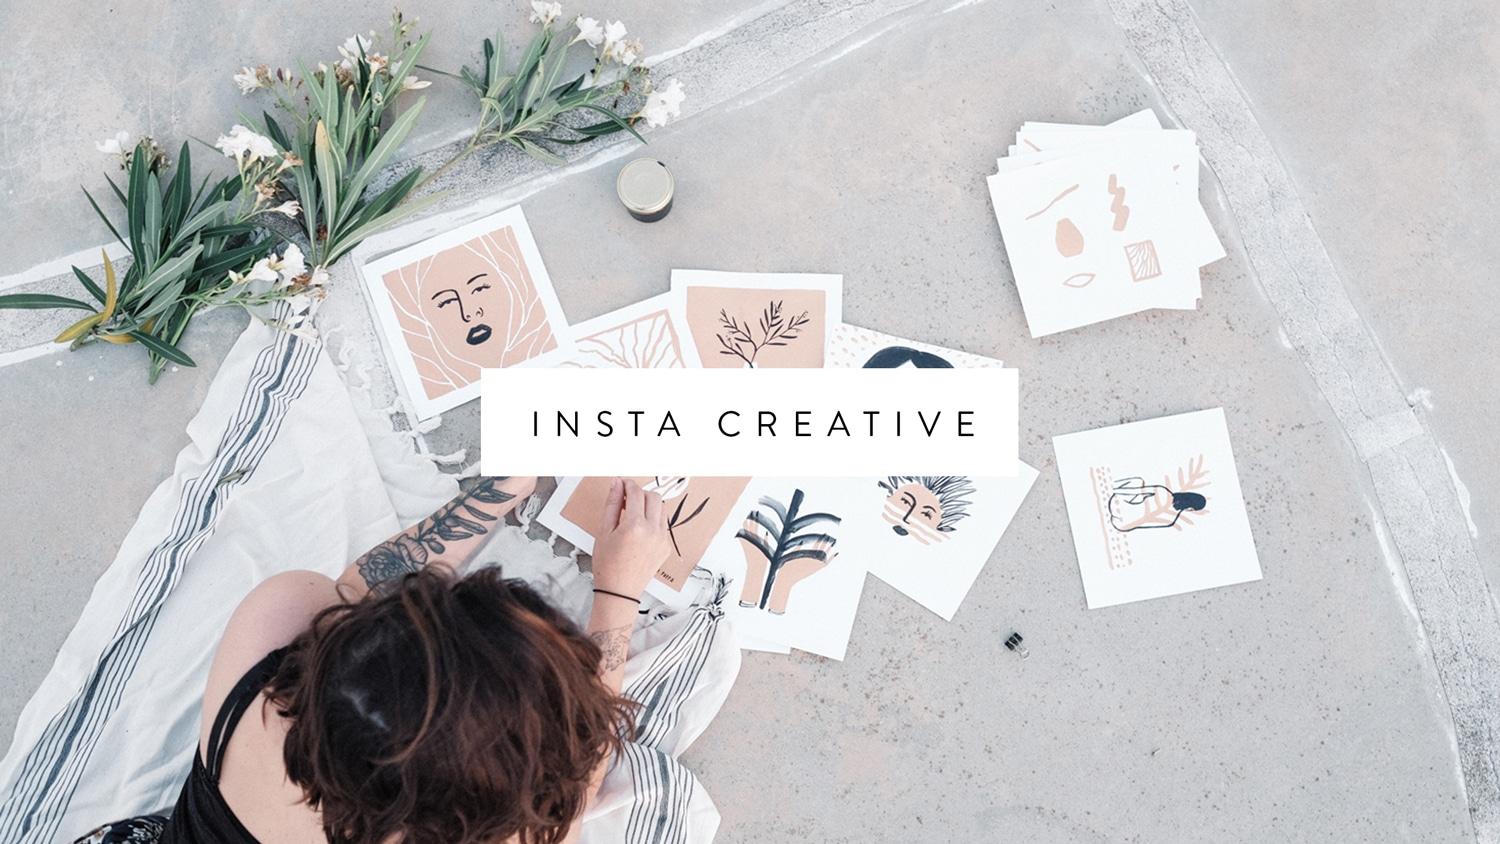 Insta-Creative-Kinlake-Course-Cover-Image-01